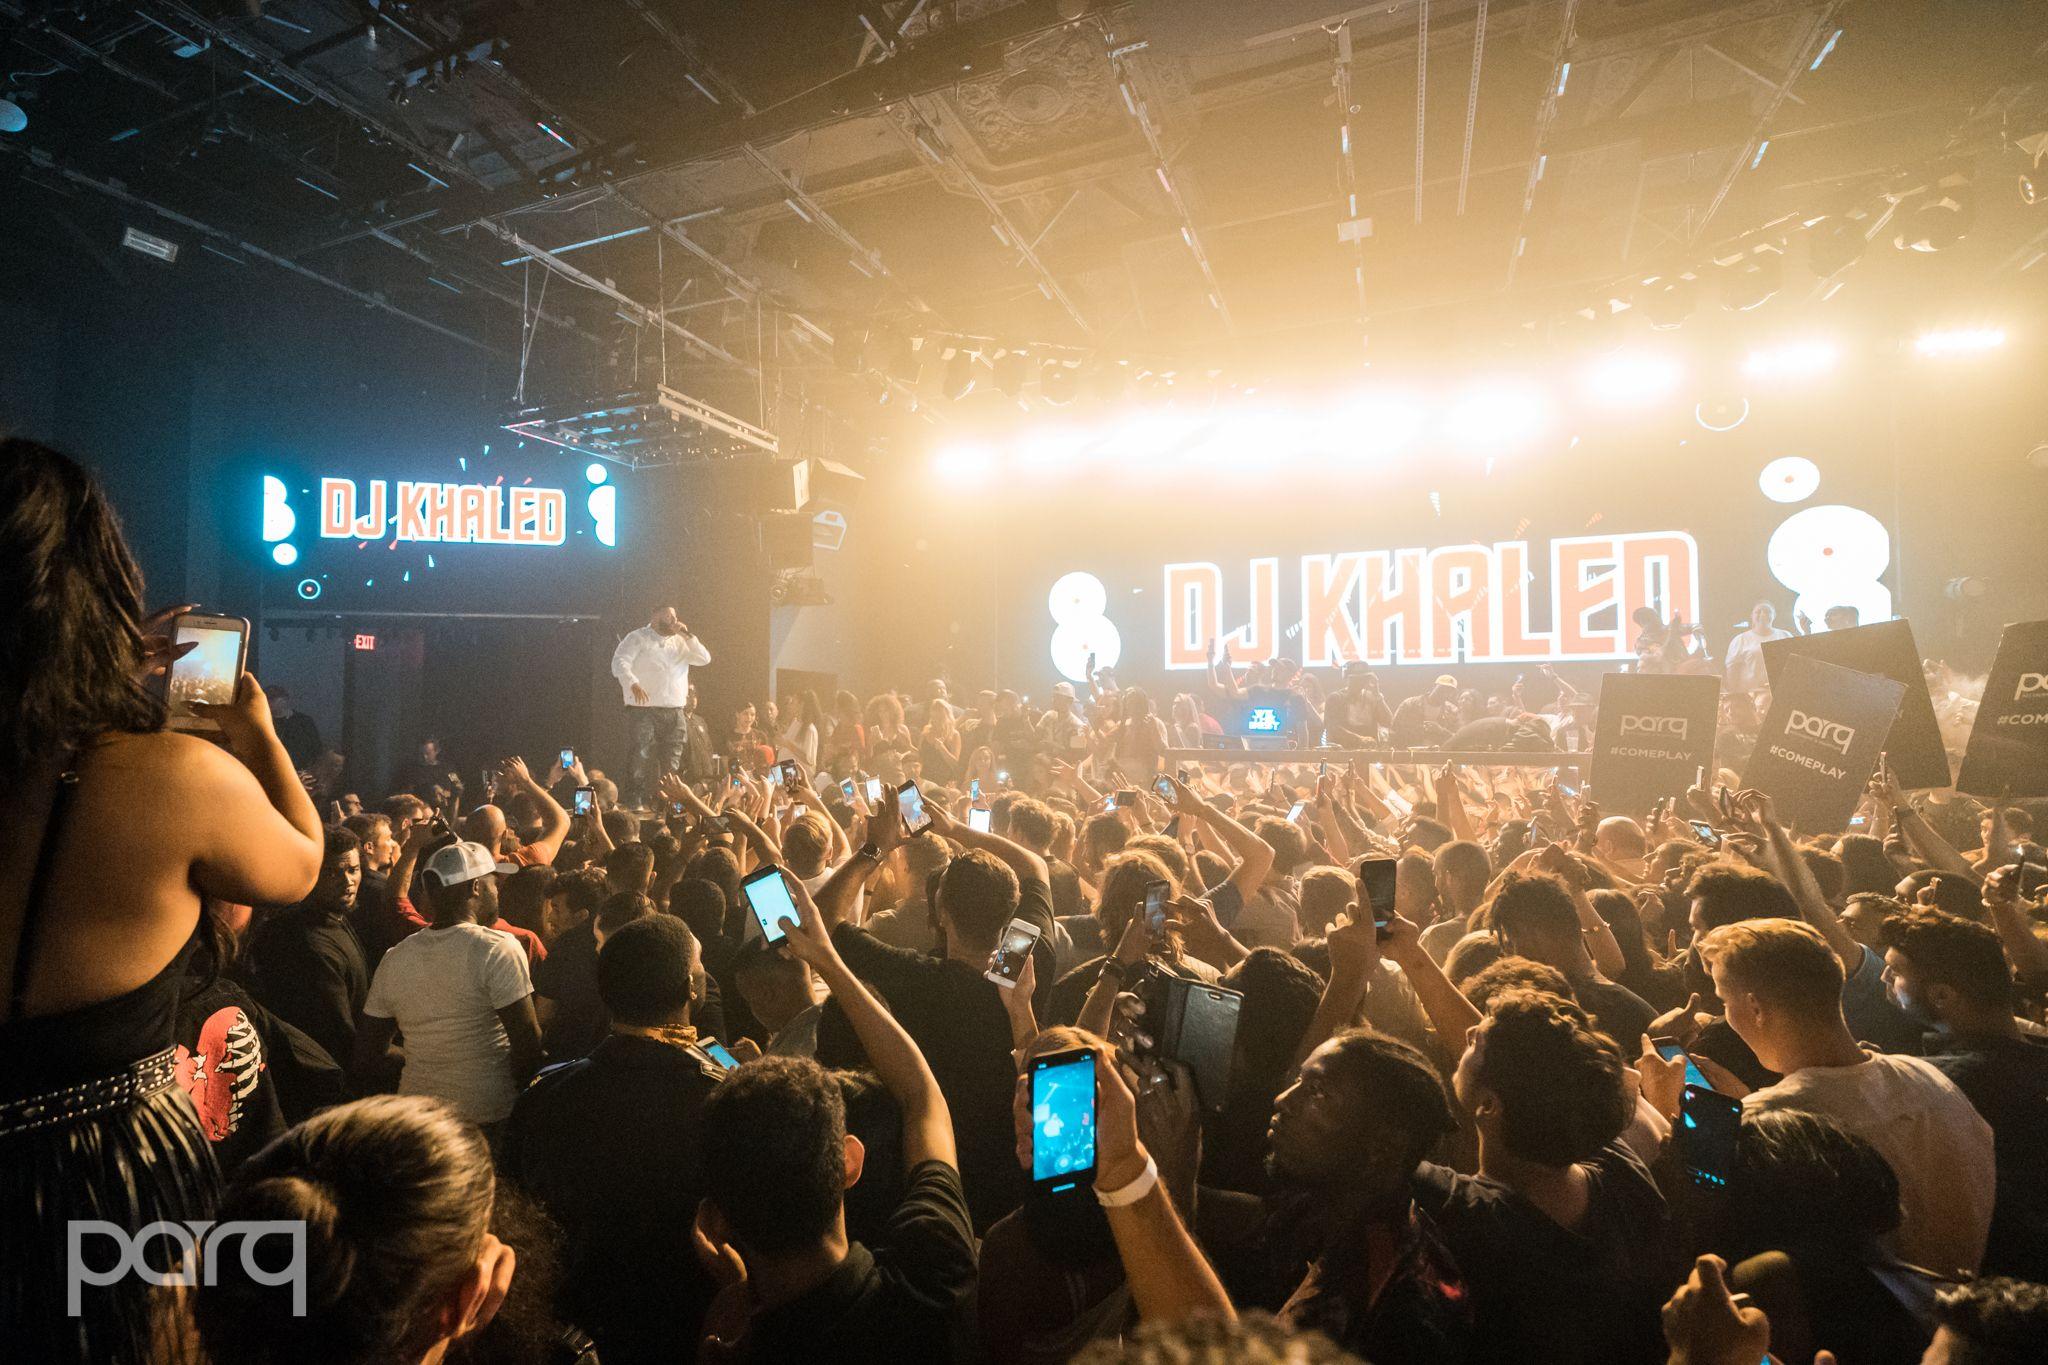 09.27.18 Parq - DJ Khaled-26.jpg